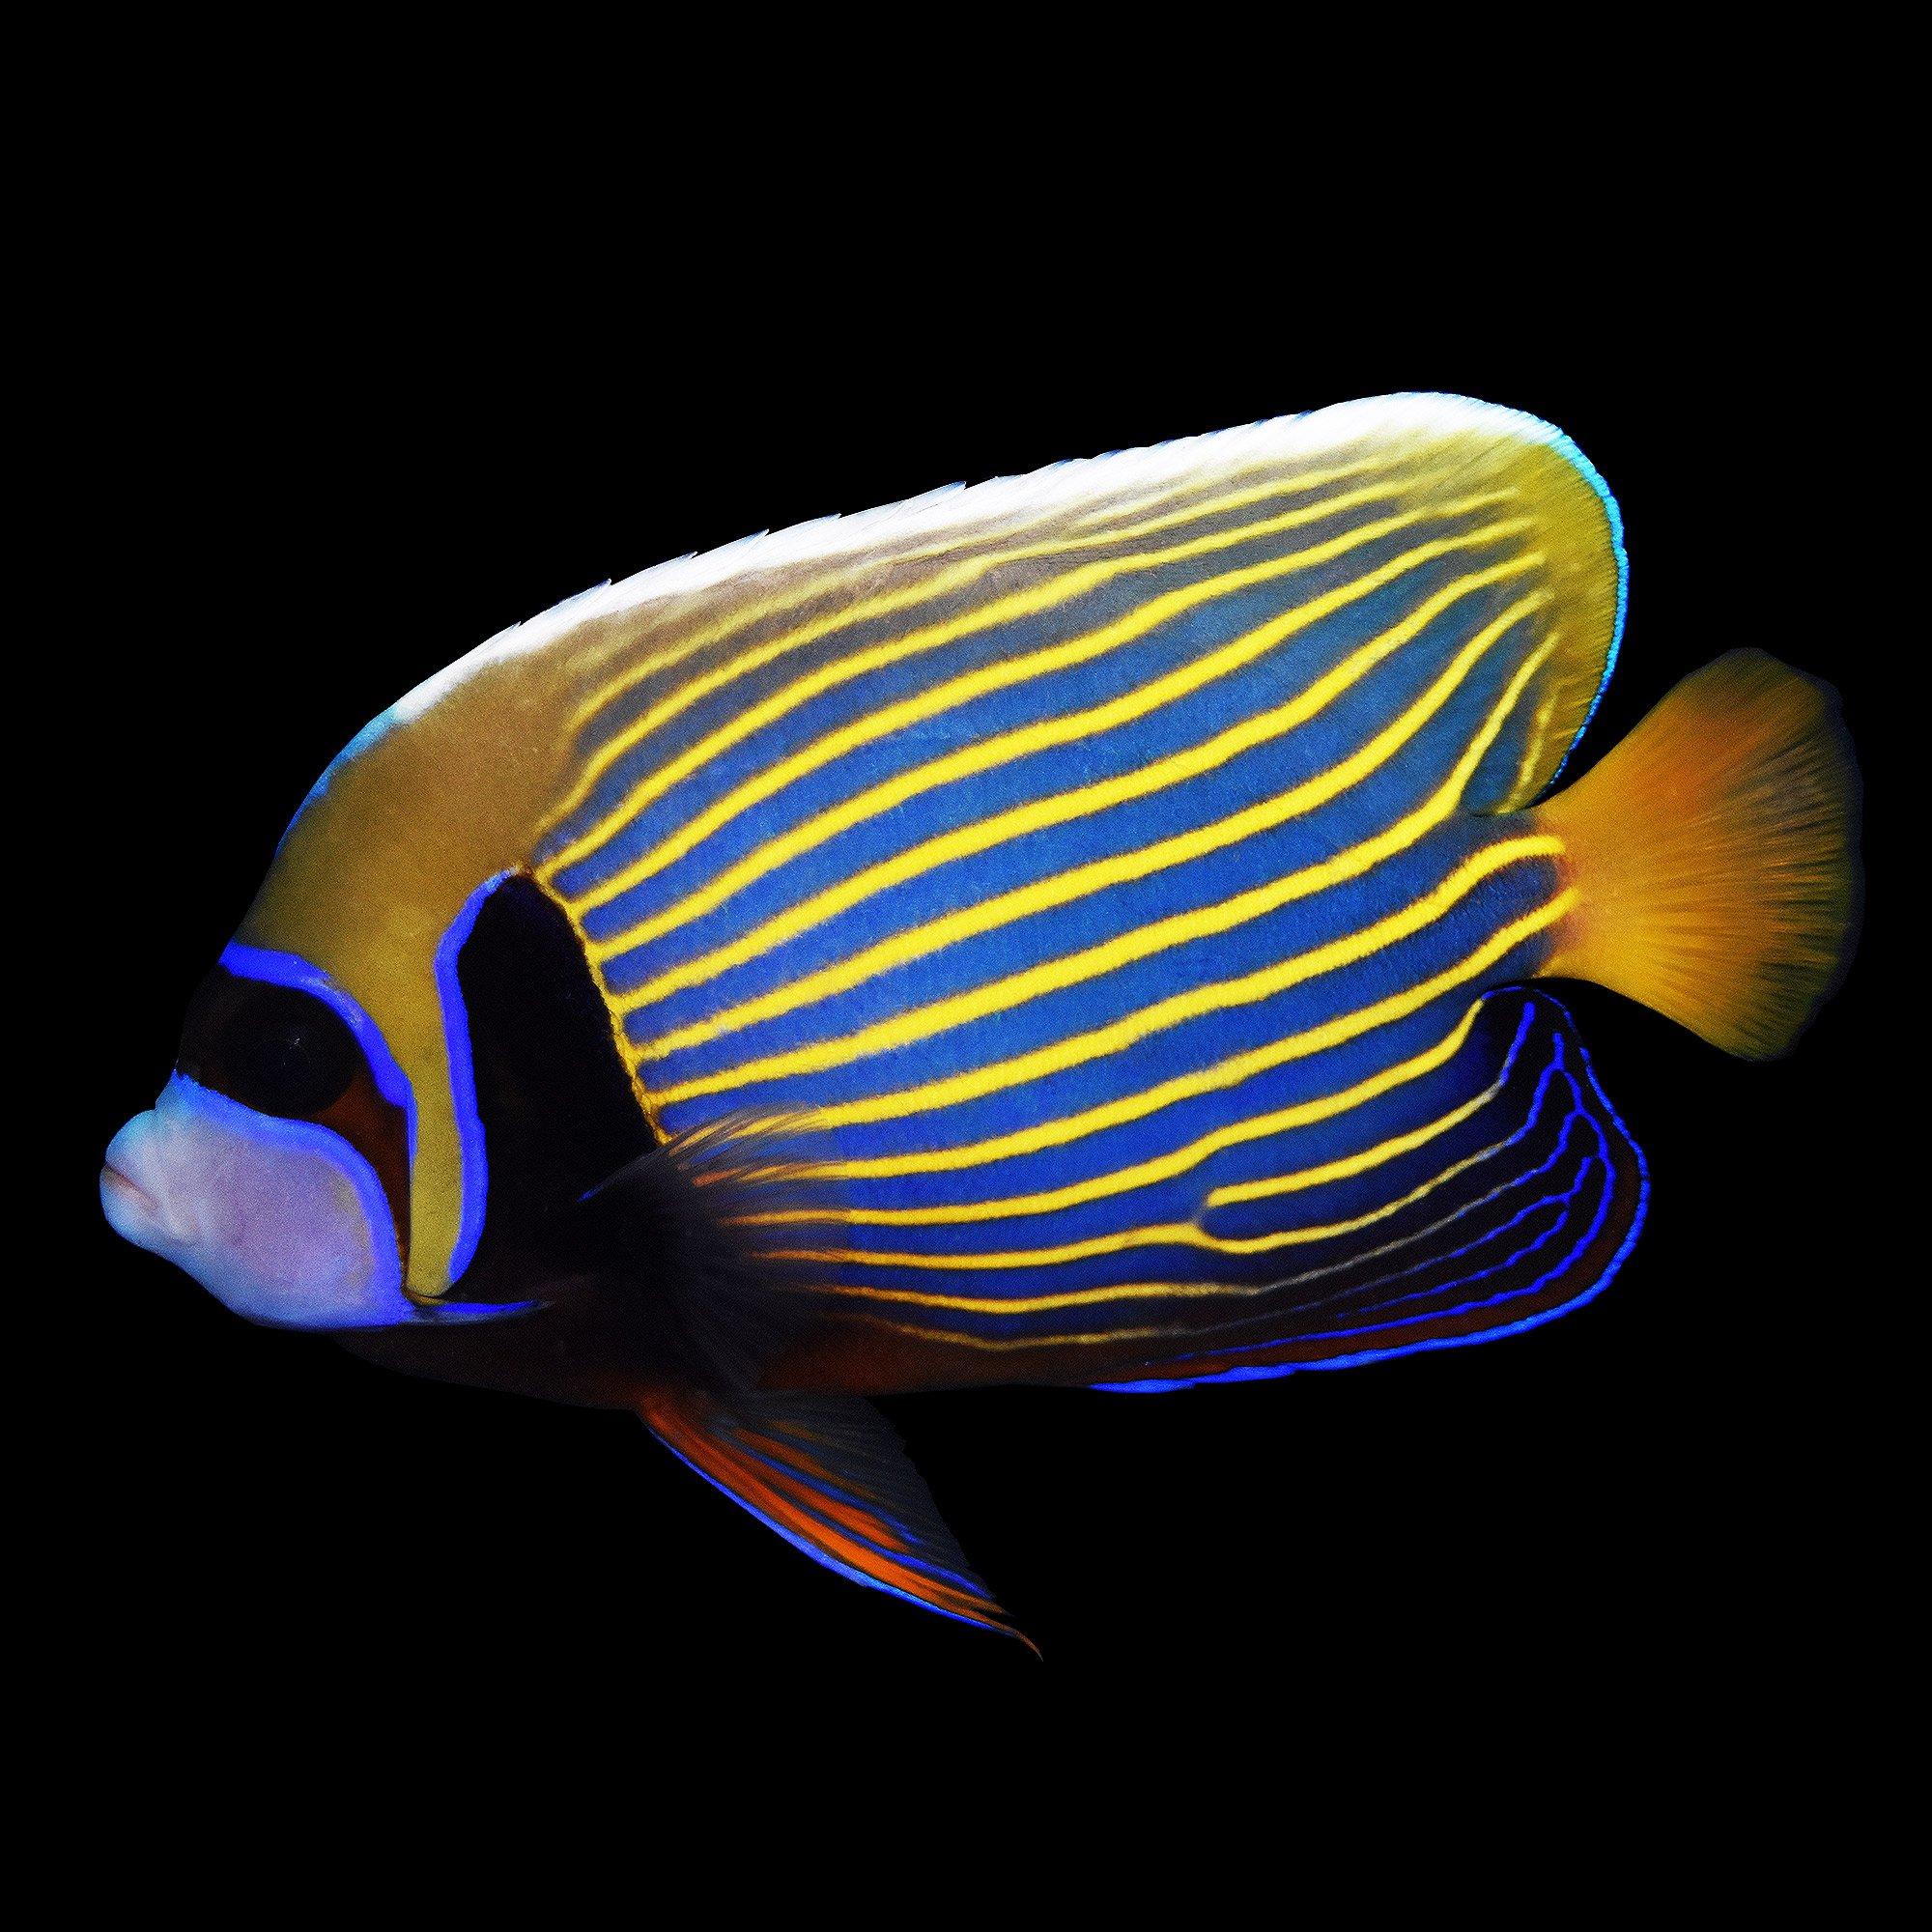 Emperor angelfish imperator angelfish adult small for Petco saltwater fish